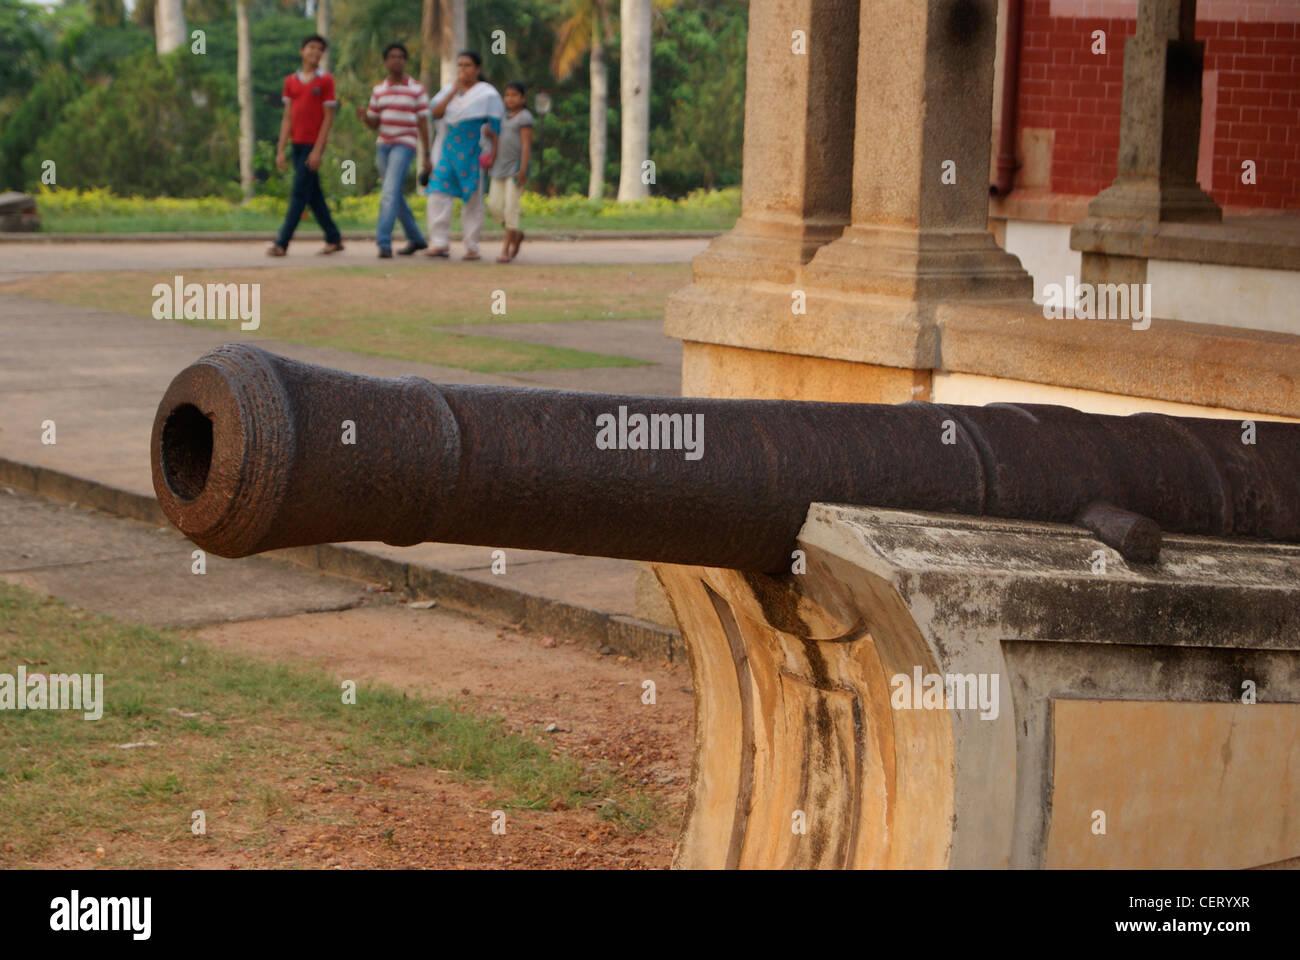 Ancient cannon war gun Displayed in Trivandrum Napier Museum ( Thiruvananthapuram Napier Museum ) of Kerala,India - Stock Image